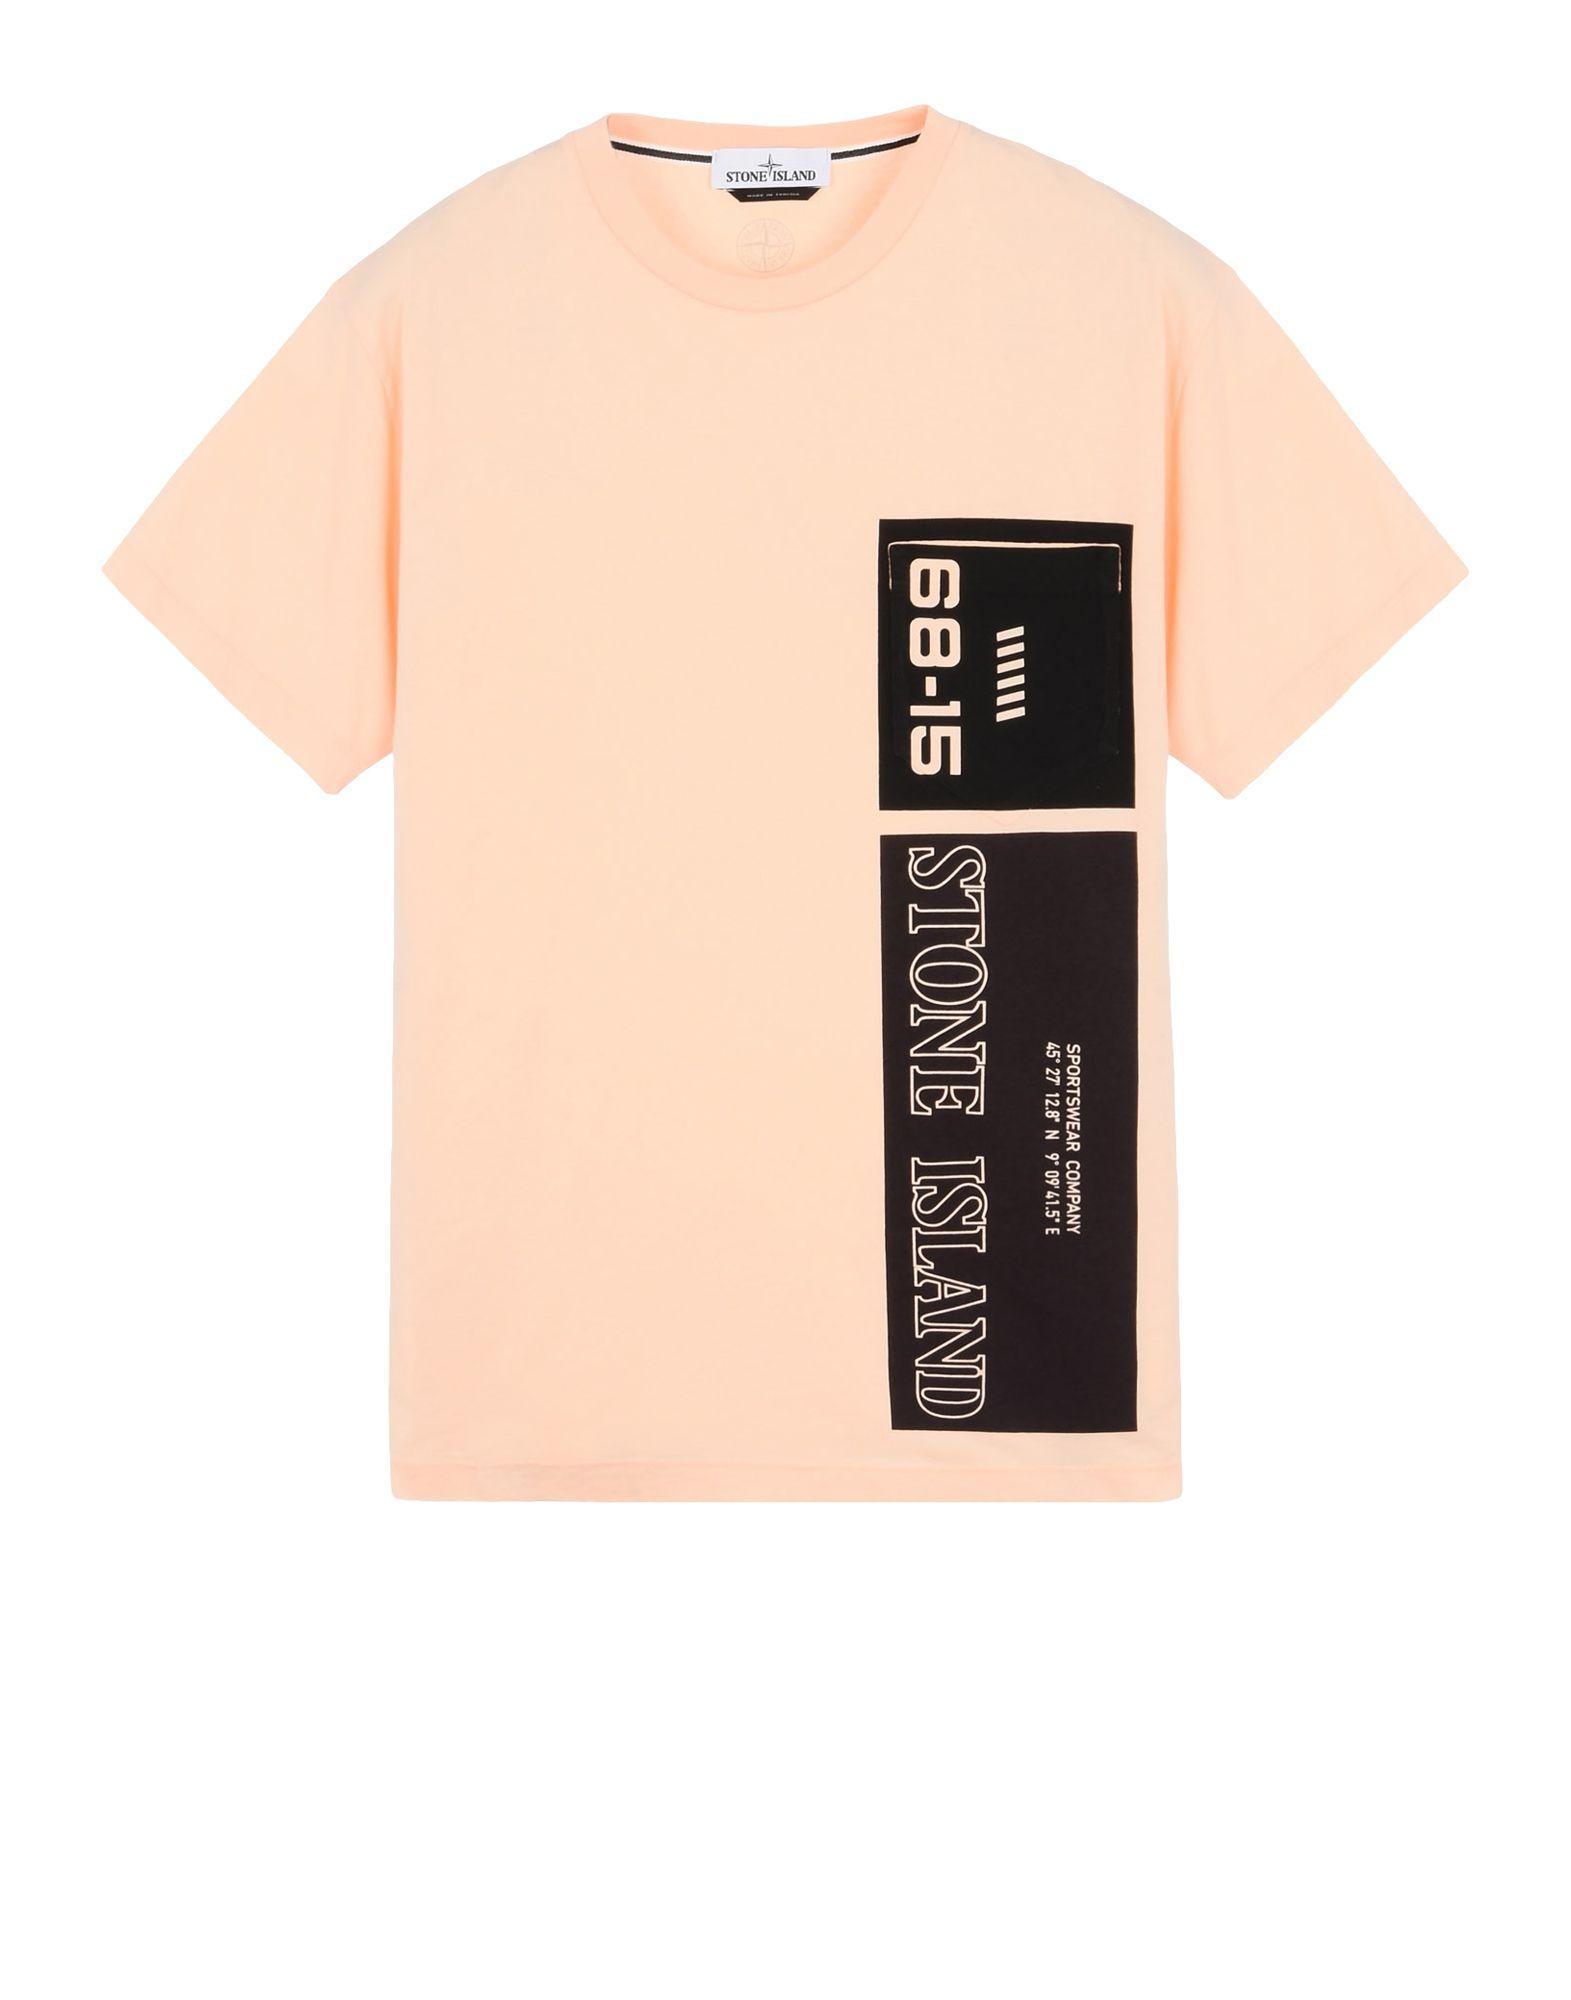 14f883031 Short Sleeve t Shirt Stone Island Men - Official Store | 18-19 ...